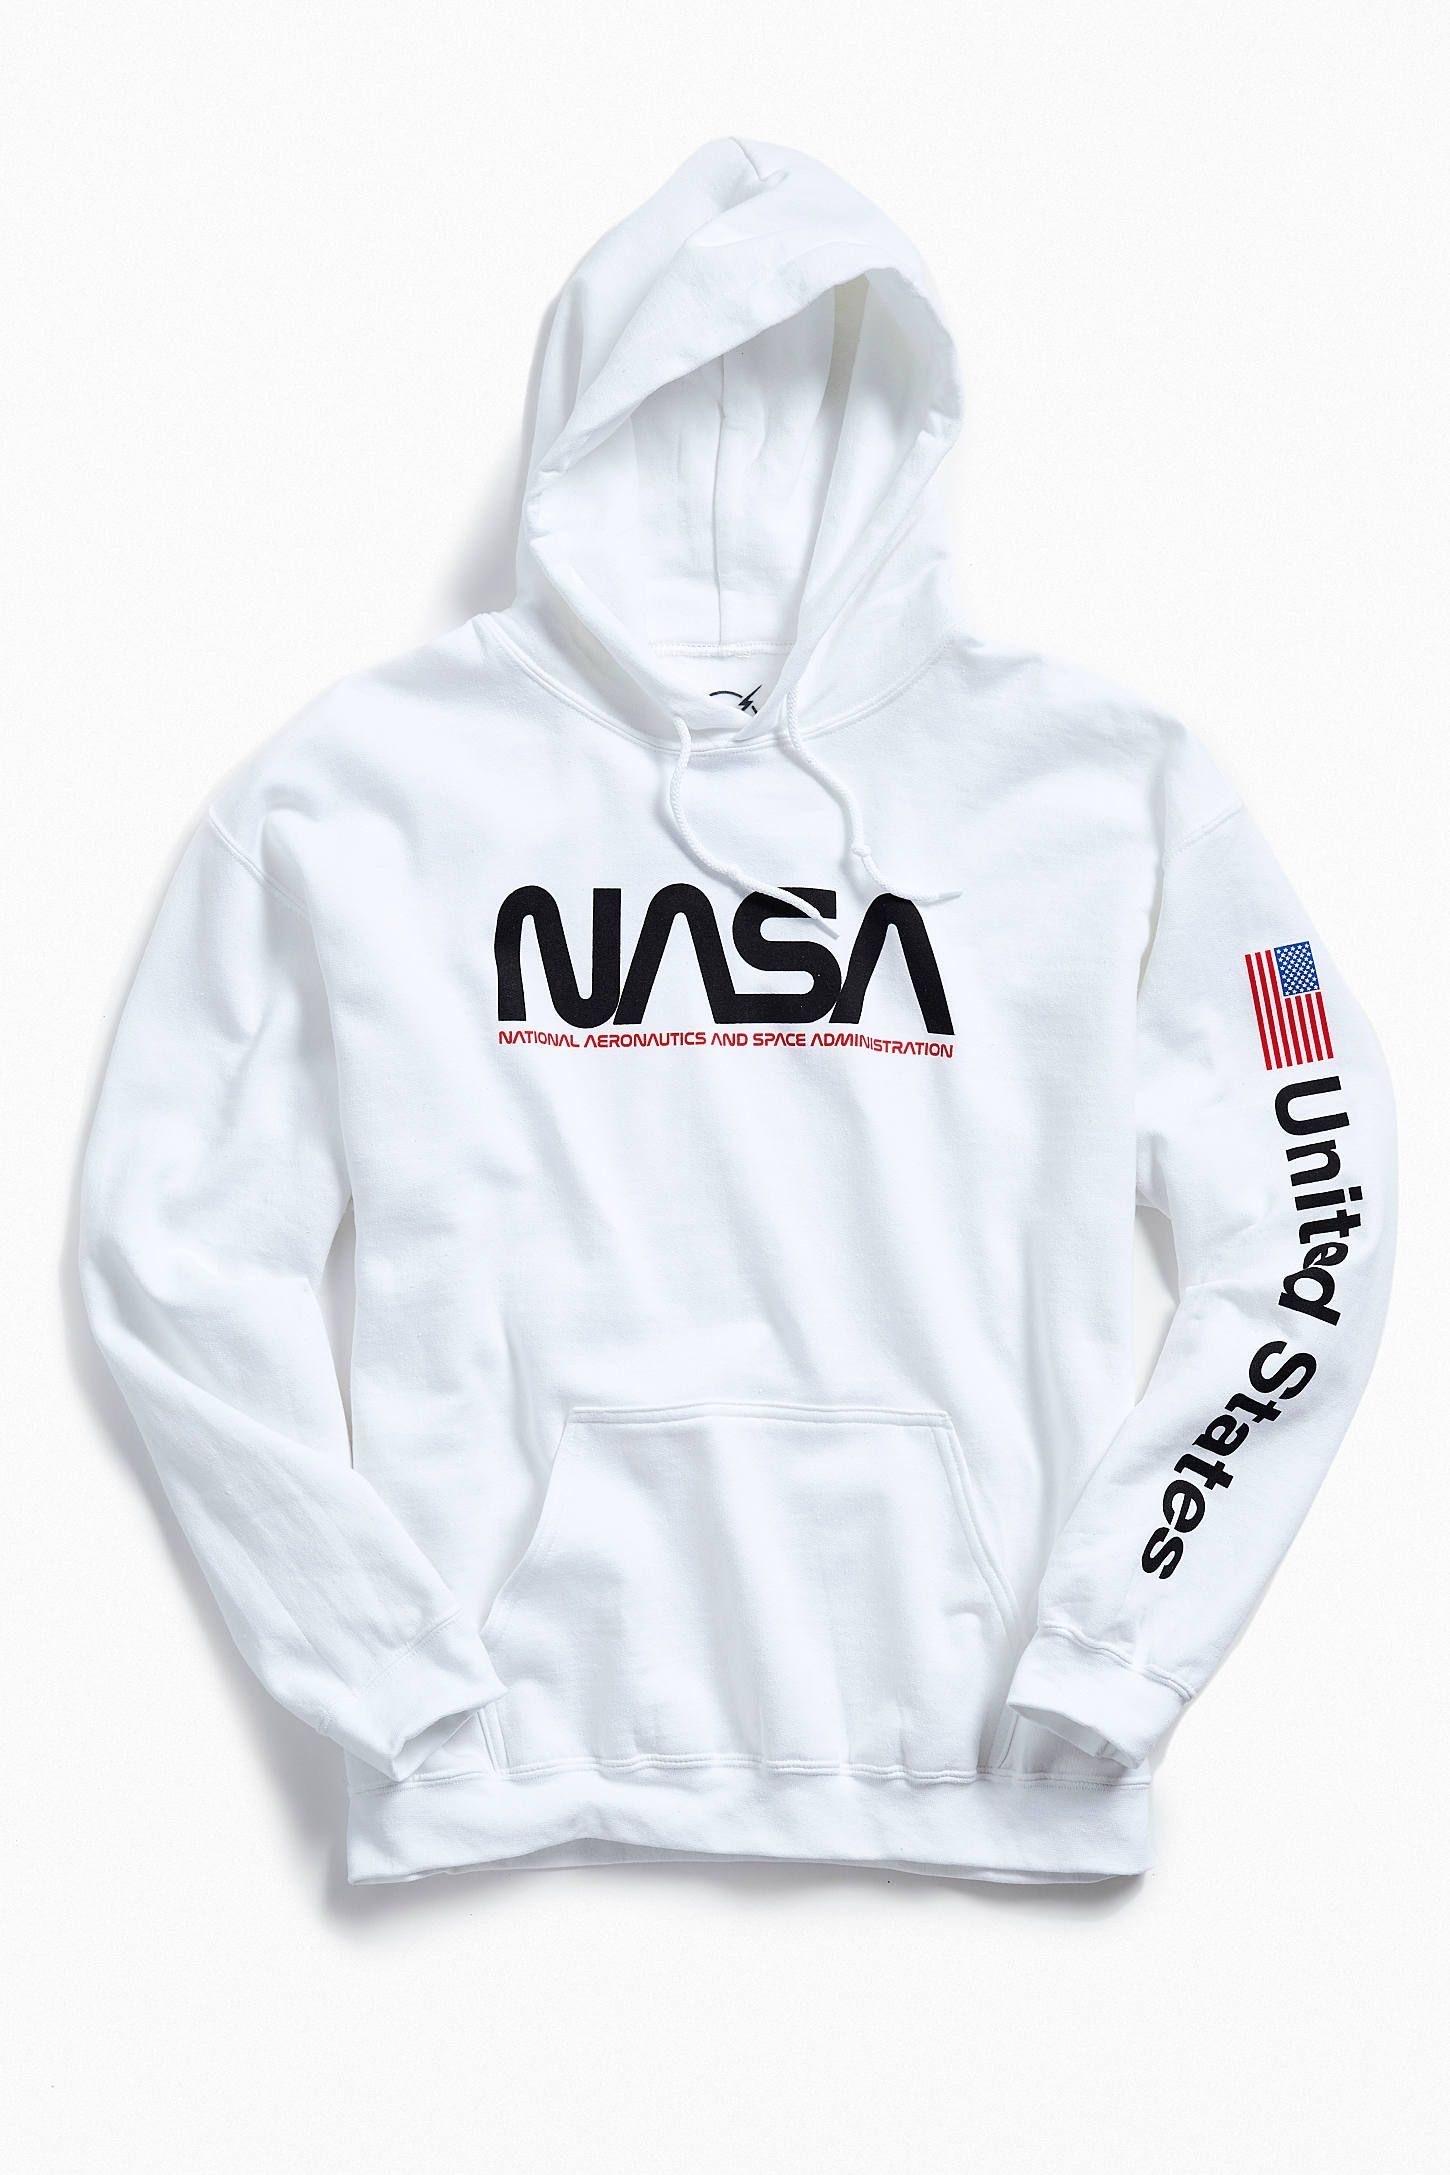 Nasa Hoodie Sweatshirt Urban Outfitters With Images Nasa